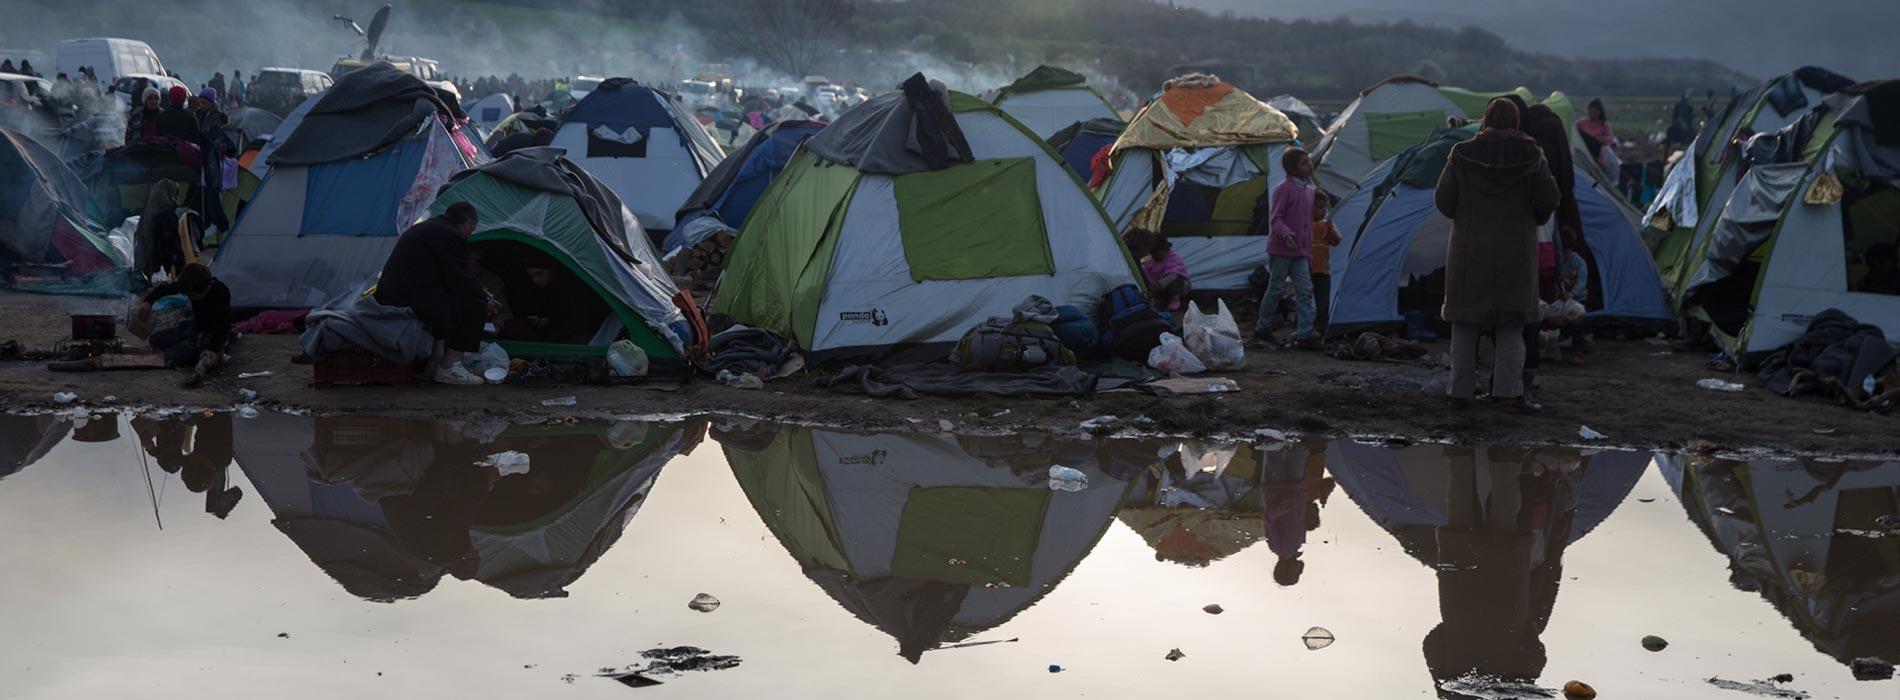 Balkanroute Foto: Björn Kietzmann